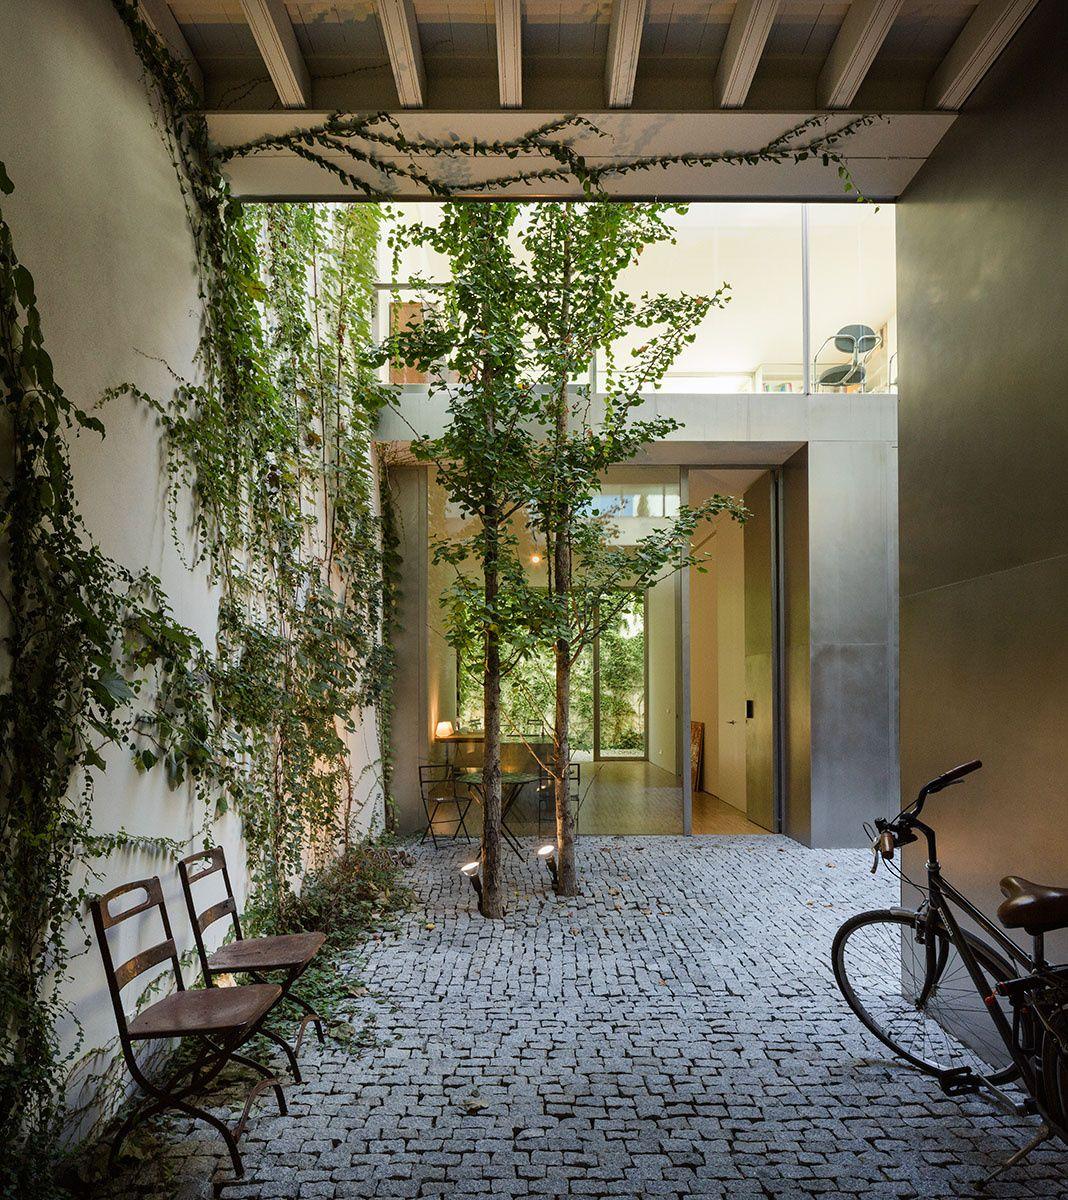 M s de 25 ideas incre bles sobre arquitectos sevilla en for Oficinas cajamar sevilla